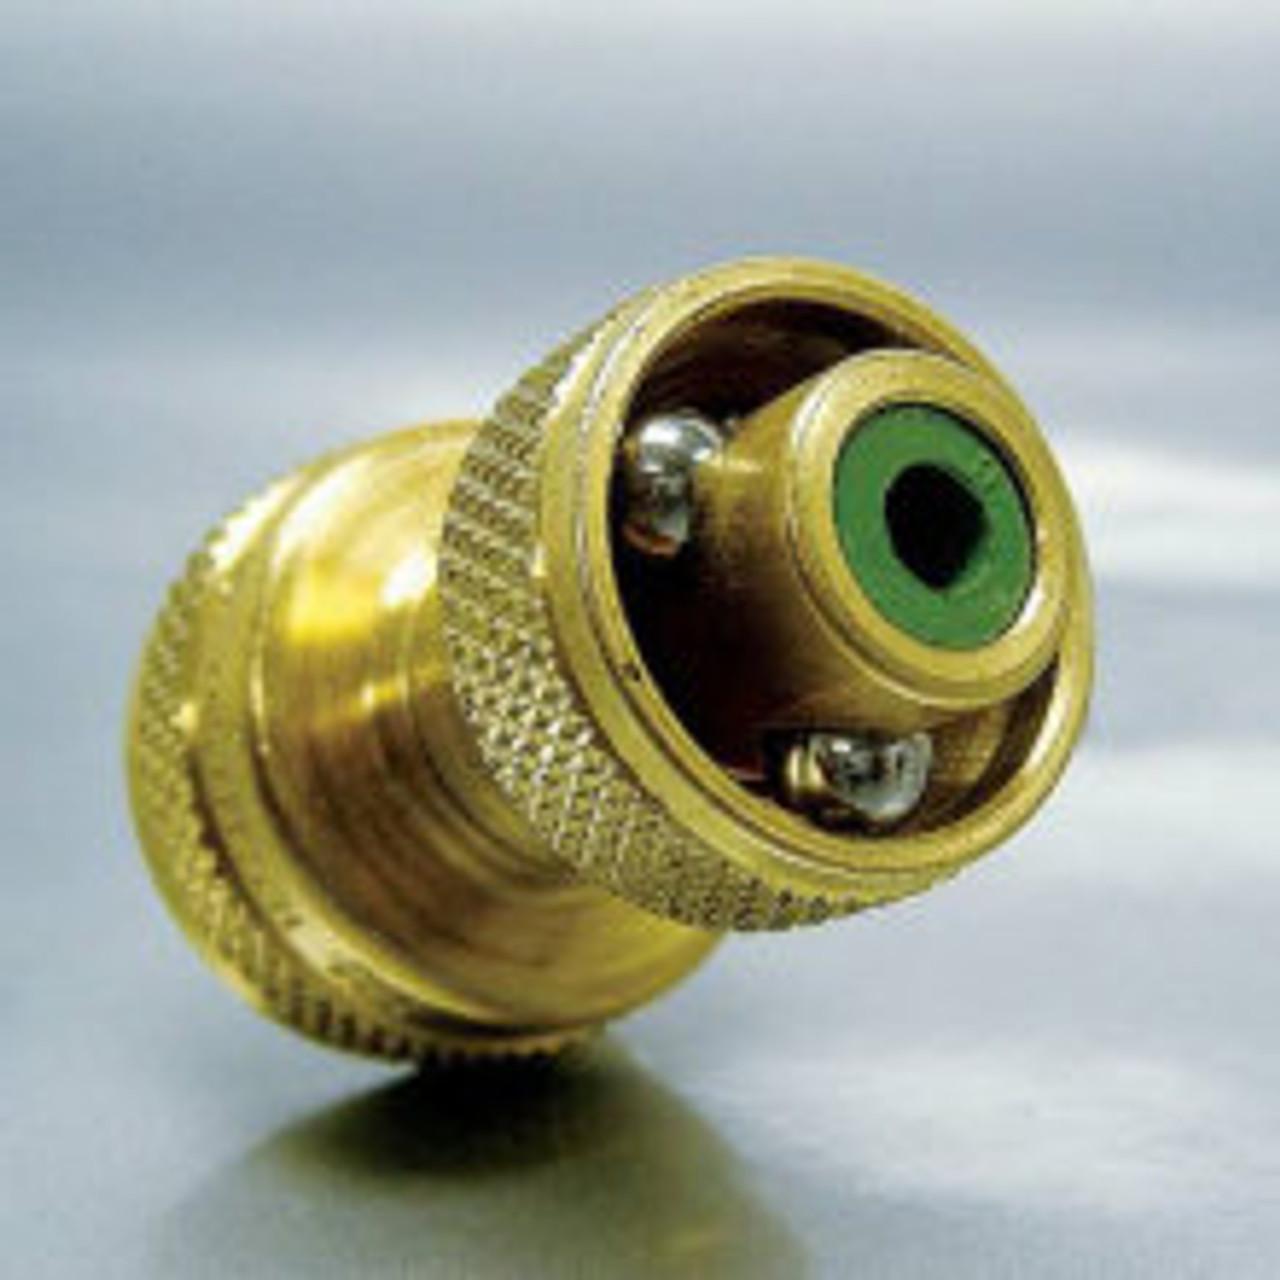 Bulls Eye Nozzle, GHT Thread, Brass